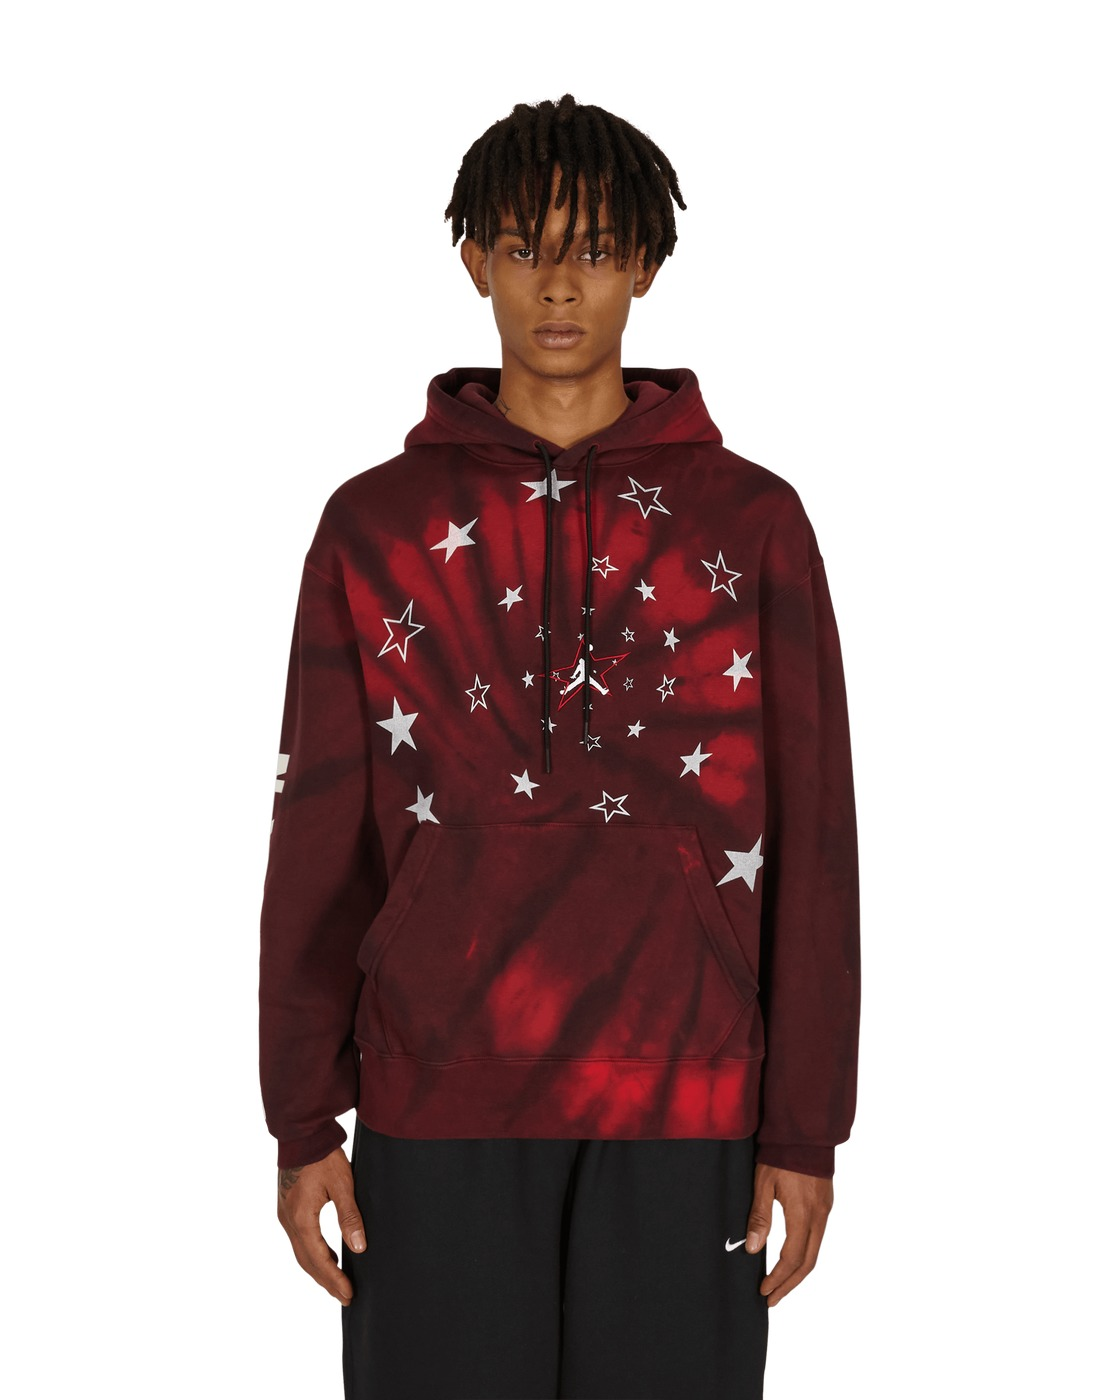 Nike Jordan Legacy Aj6 Hooded Sweatshirt Black/Gym Red